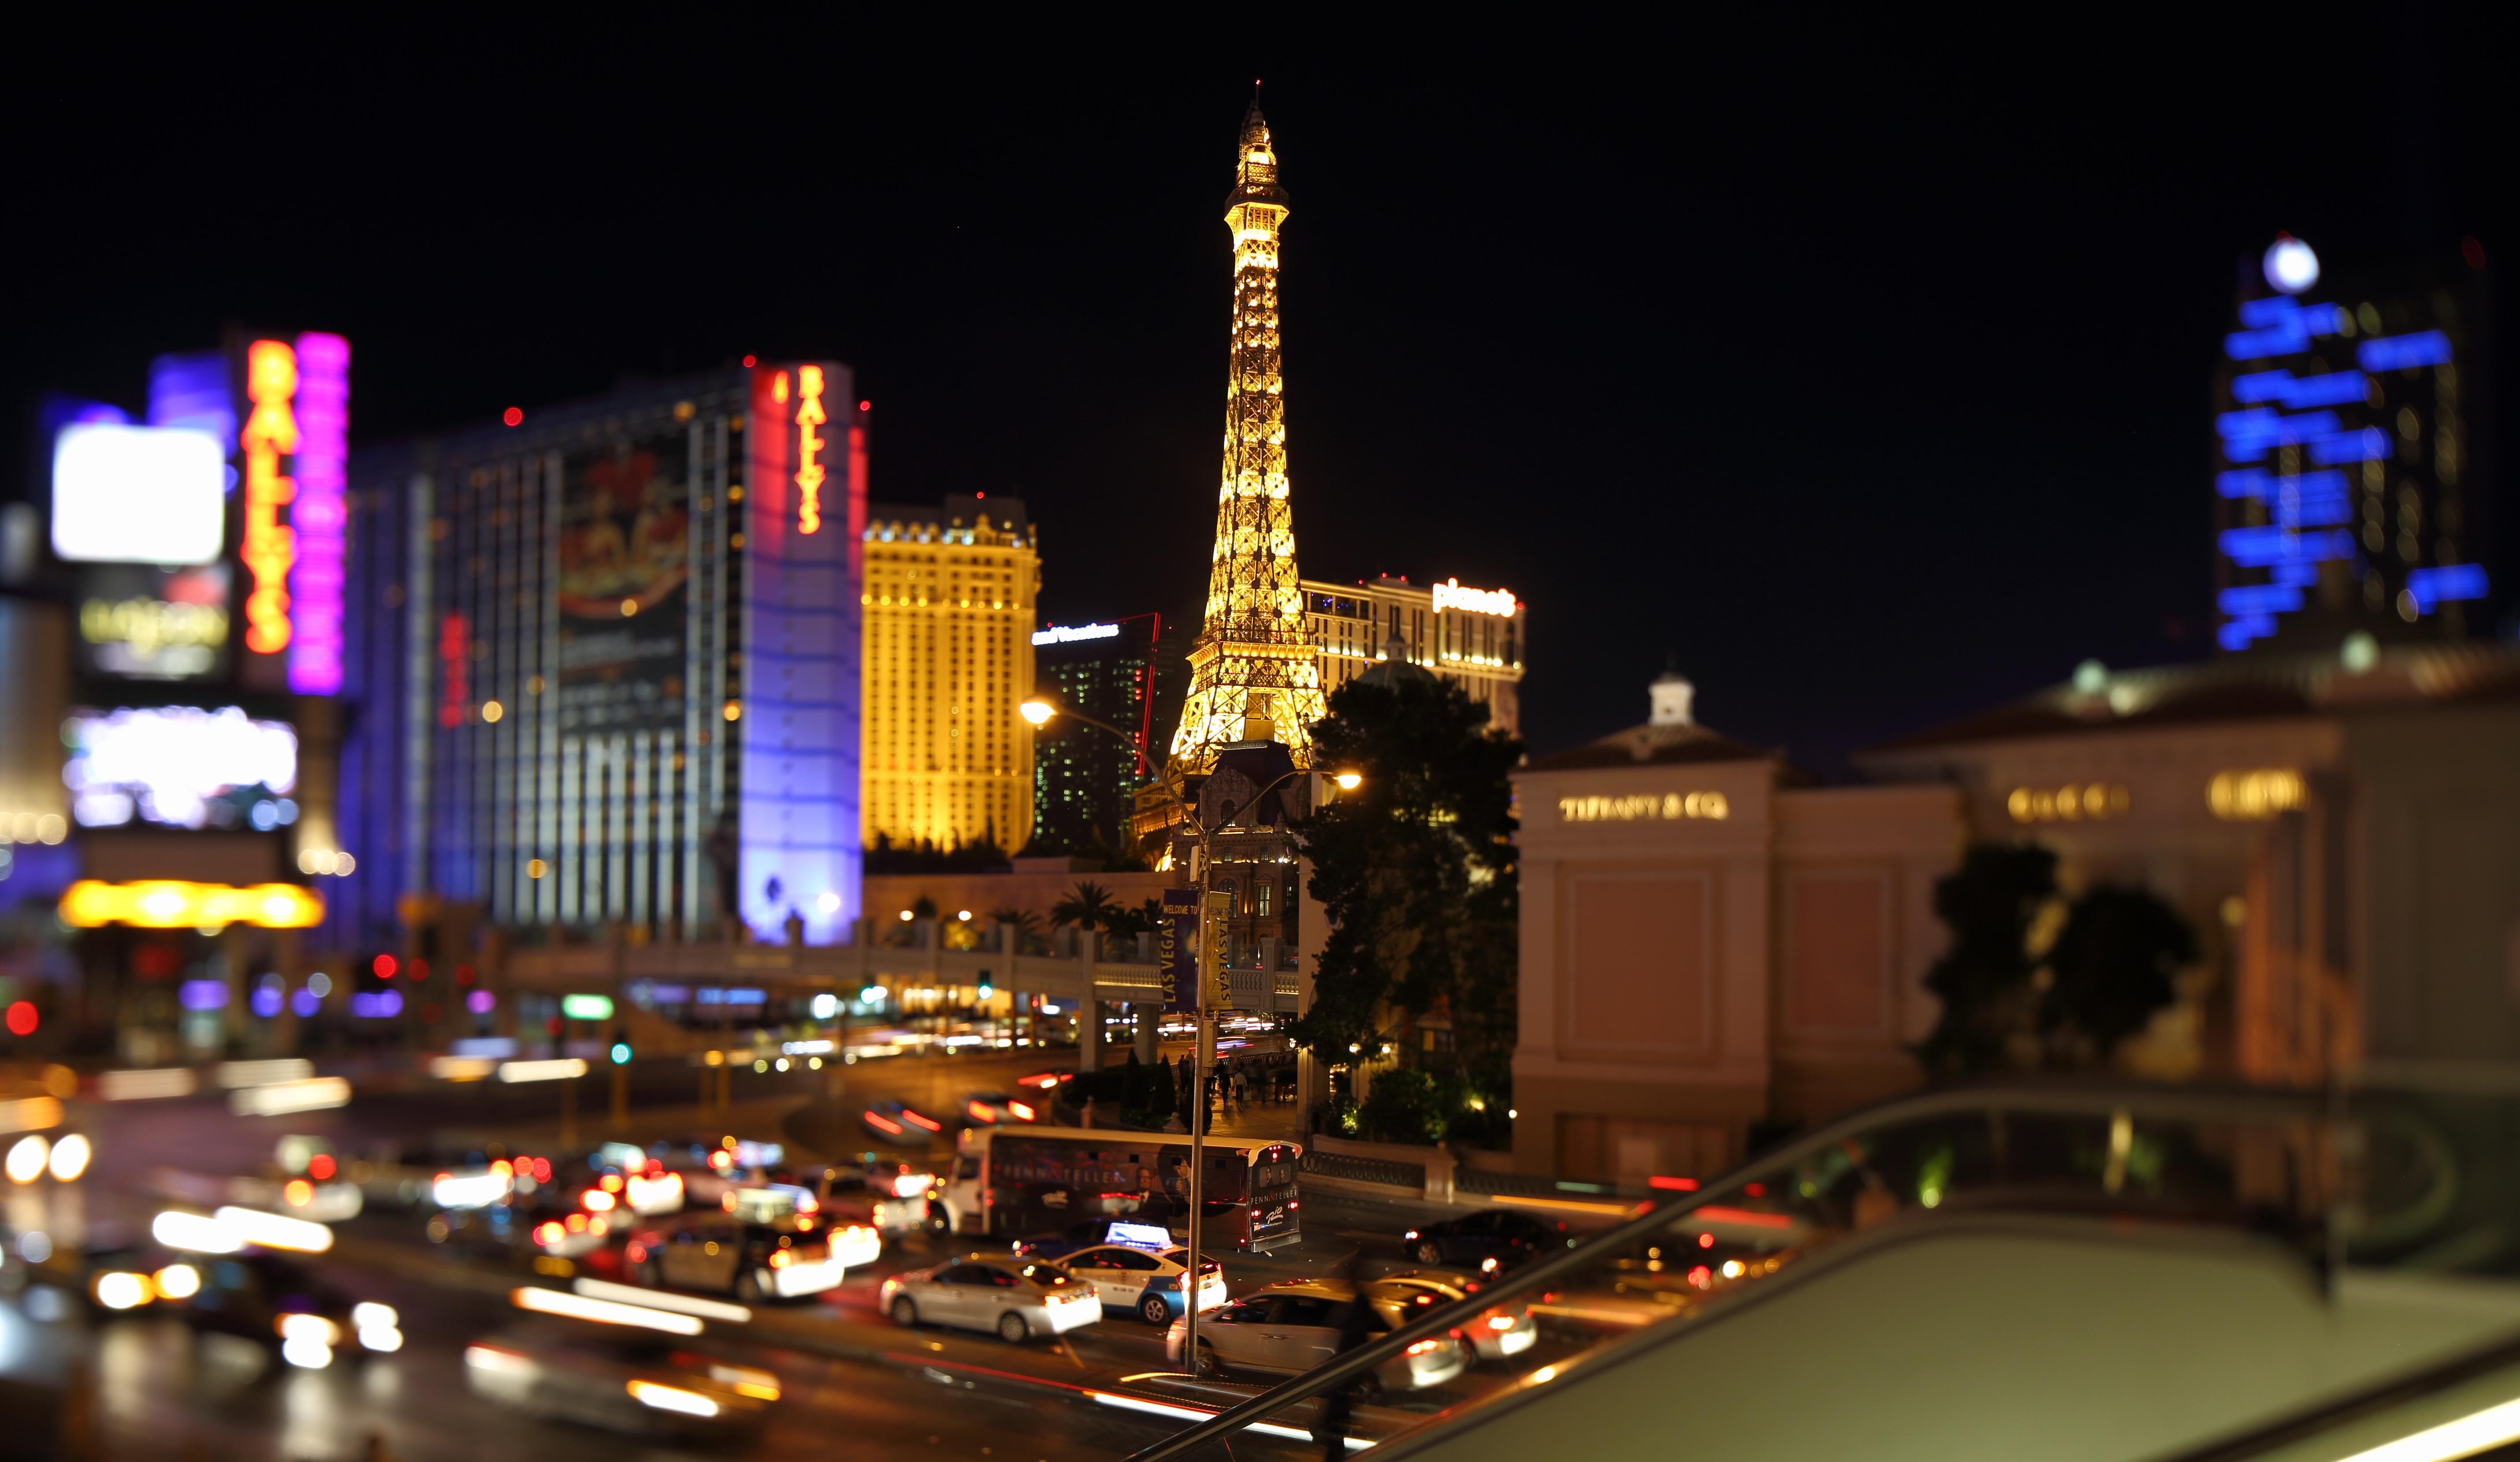 Las Vegas Về đêm